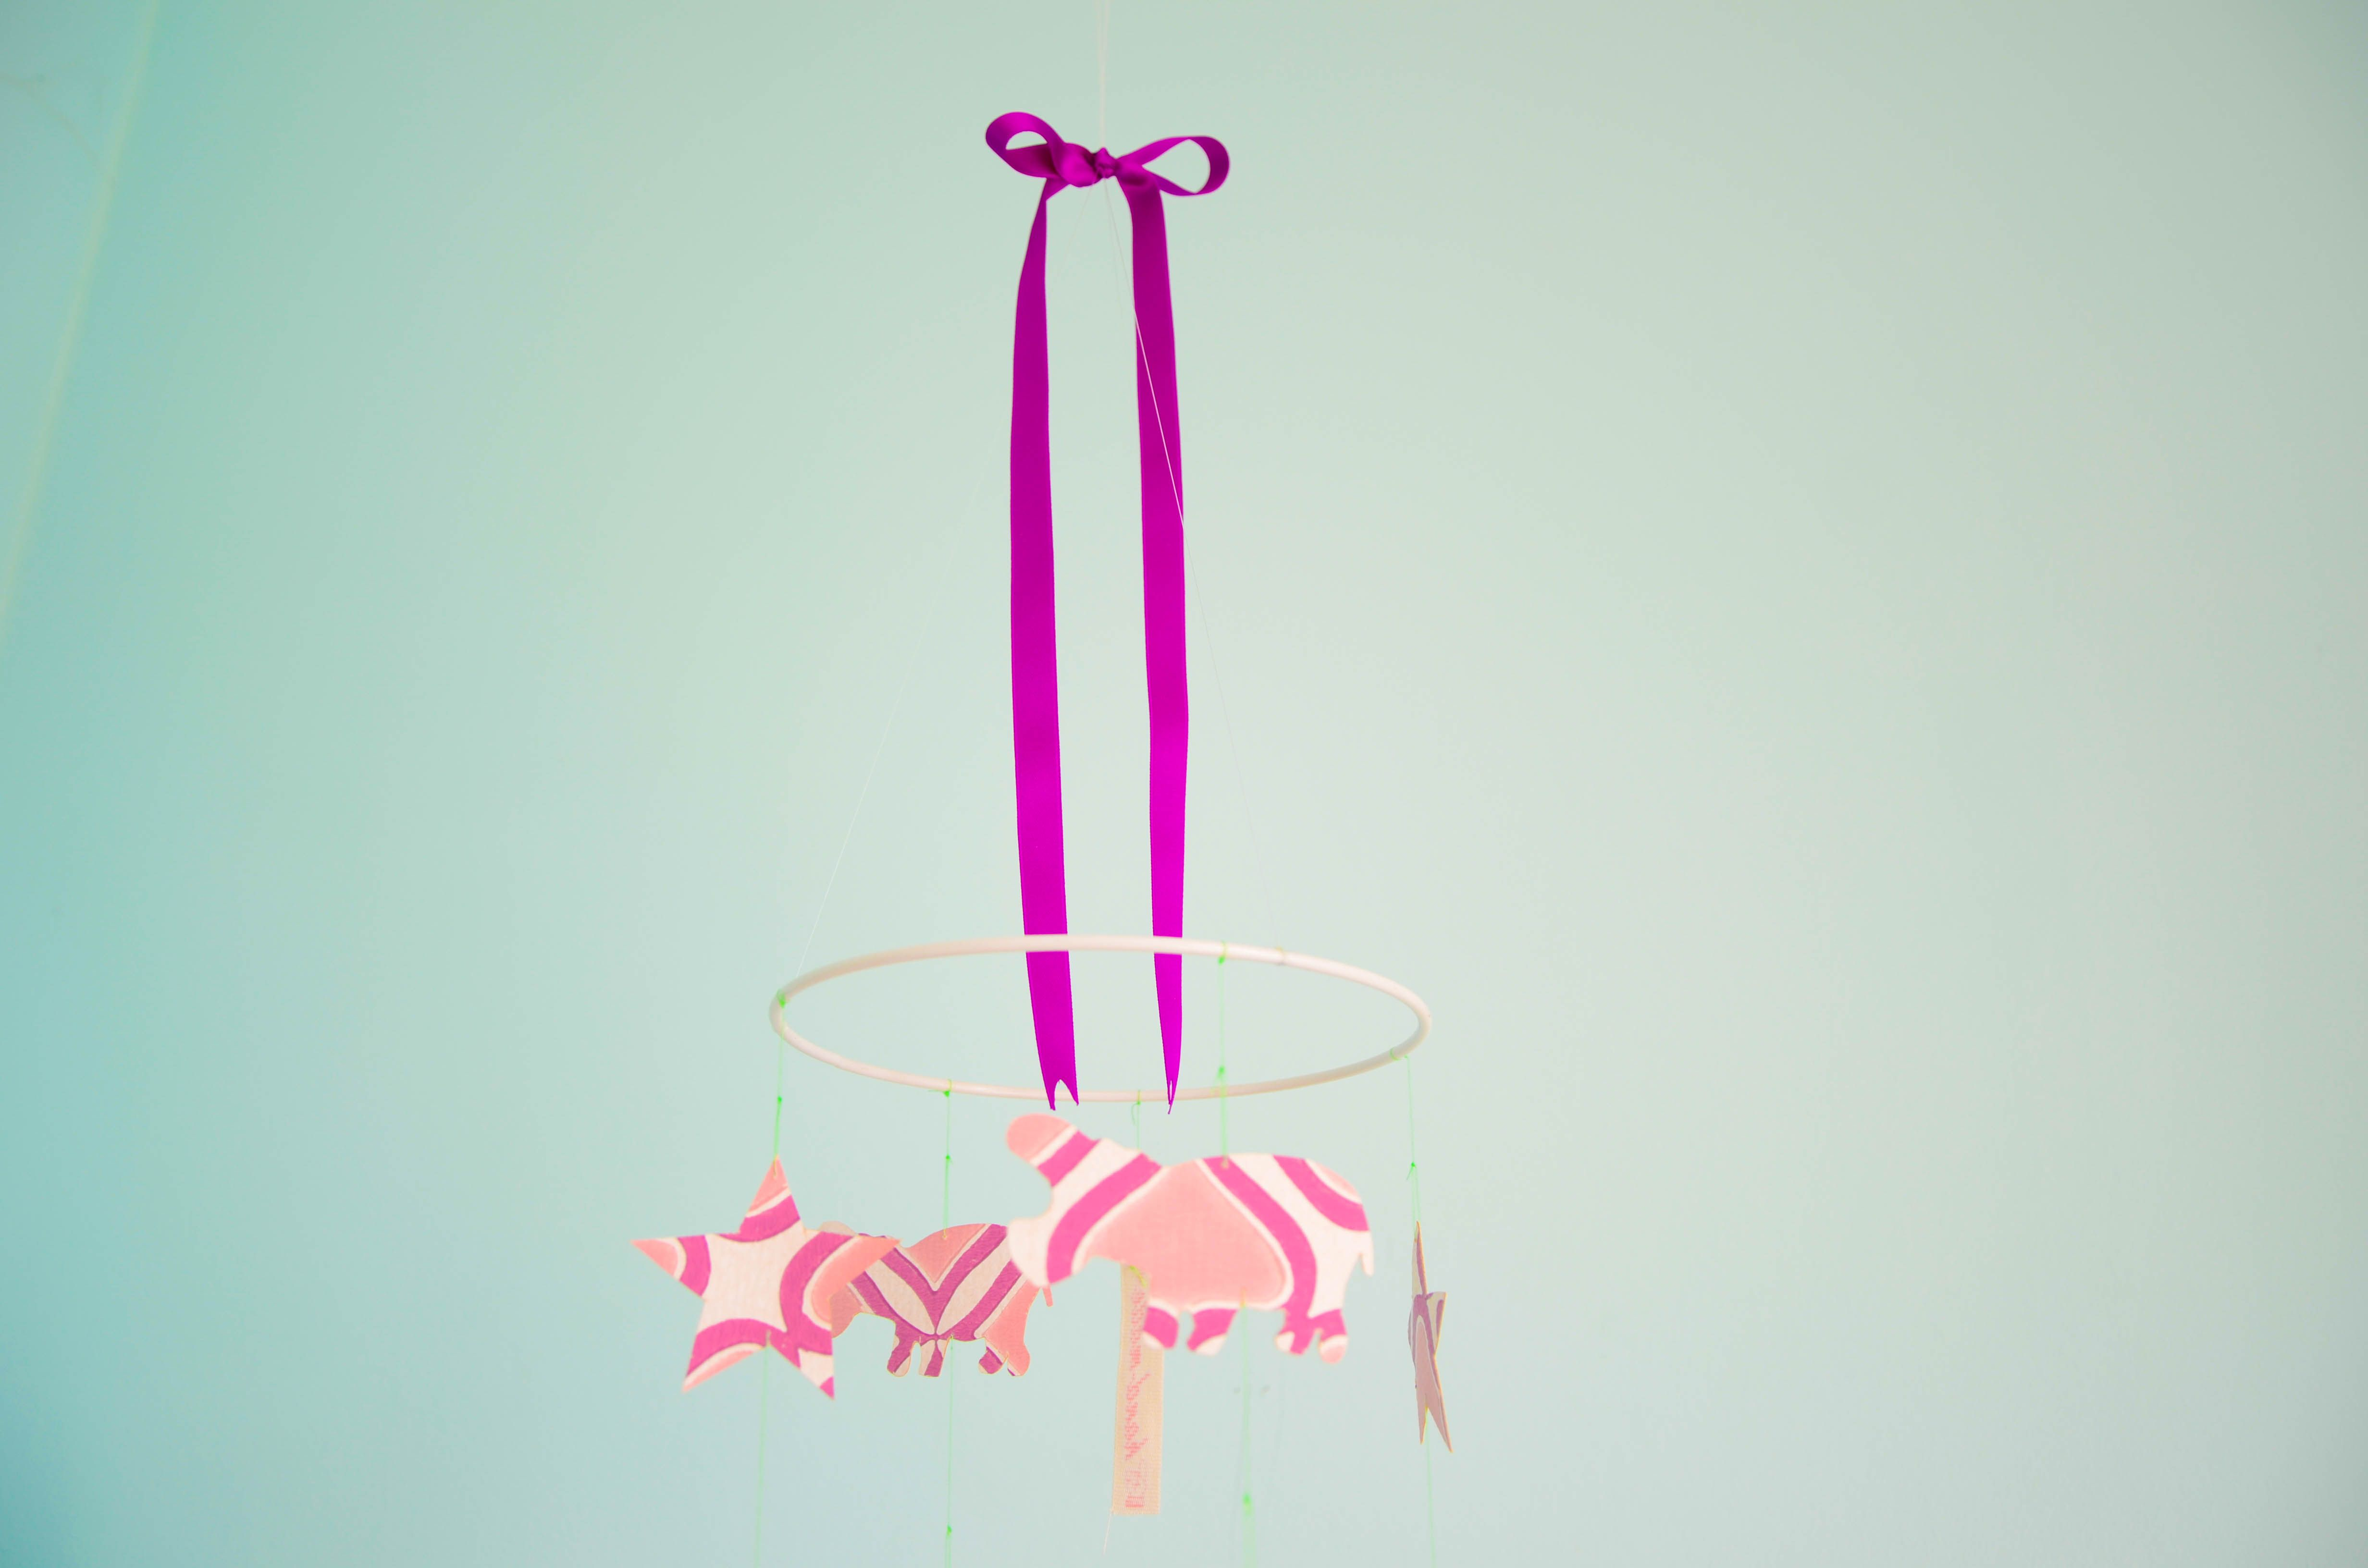 mobile, sterne & nilpferde aus tapete, #rehkitz #lila #rosa #stern ... - Kinderzimmer Deko Lila